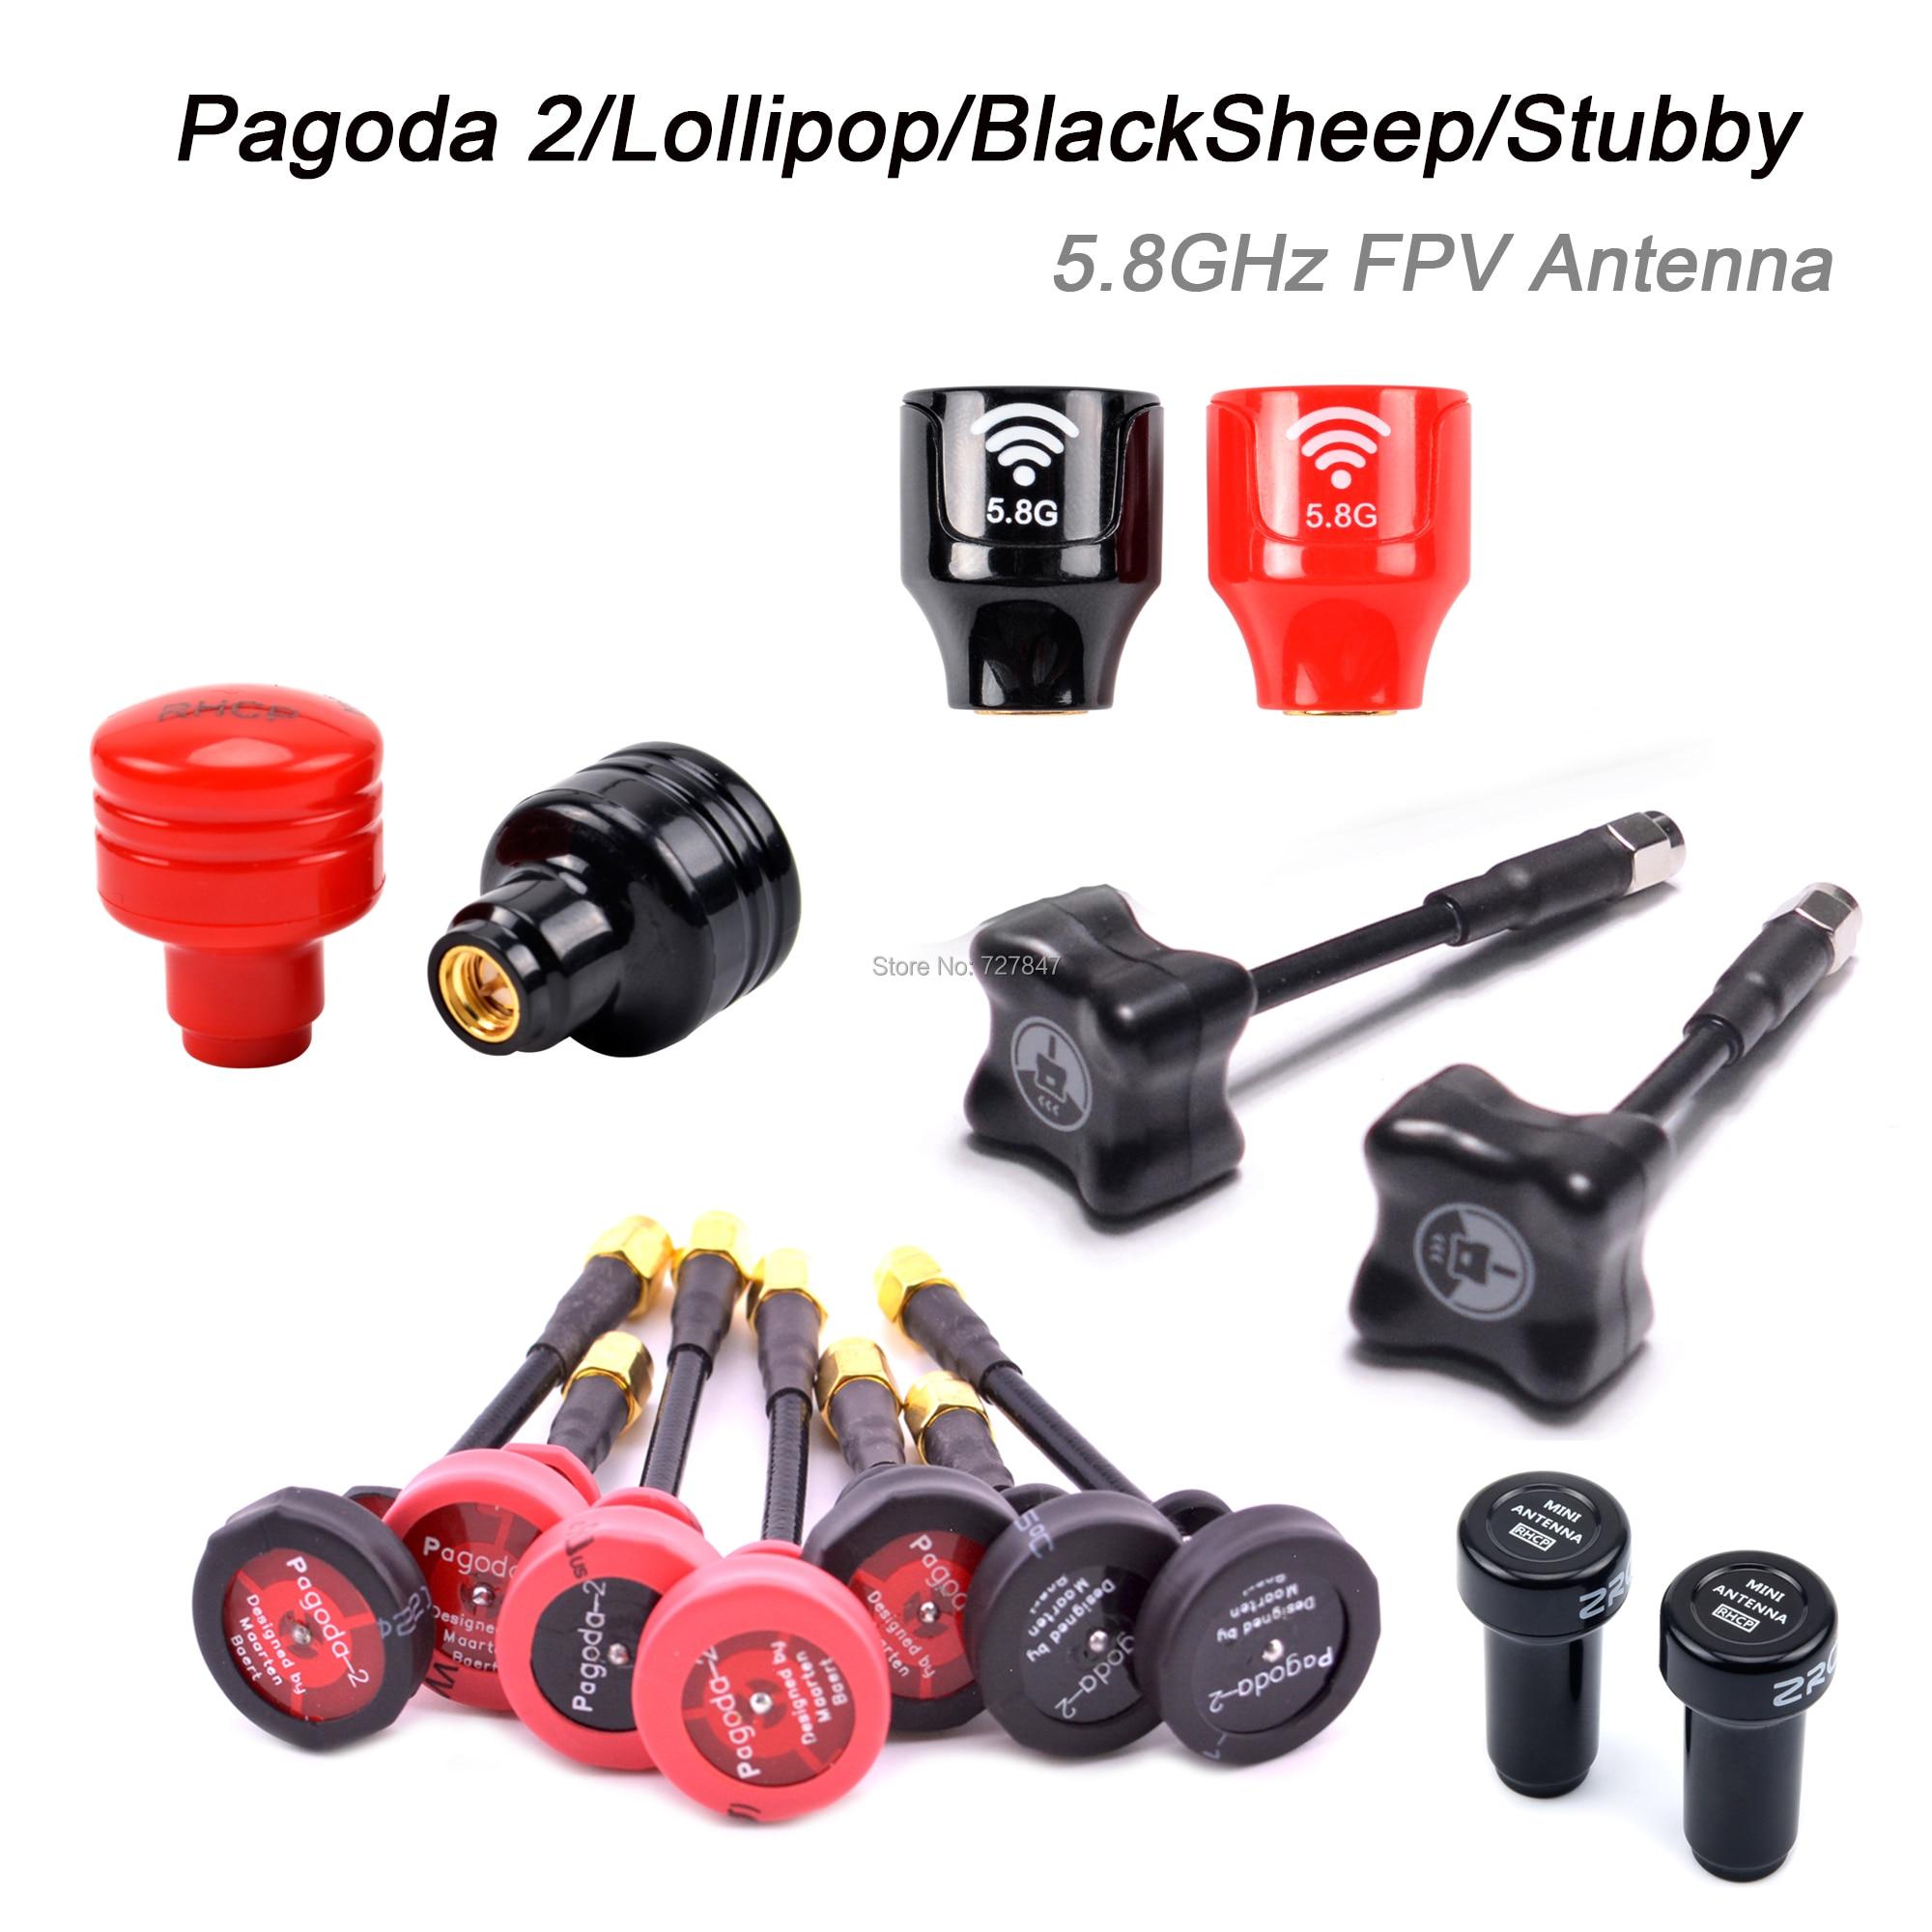 Pagoda 2 / Lollipop / BlackSheep / Stubby 5.8GHz FPV Antenna SMA / RP-SMA / MMCX / UFL Plug For RC FPV Racing Drone Quadcopter